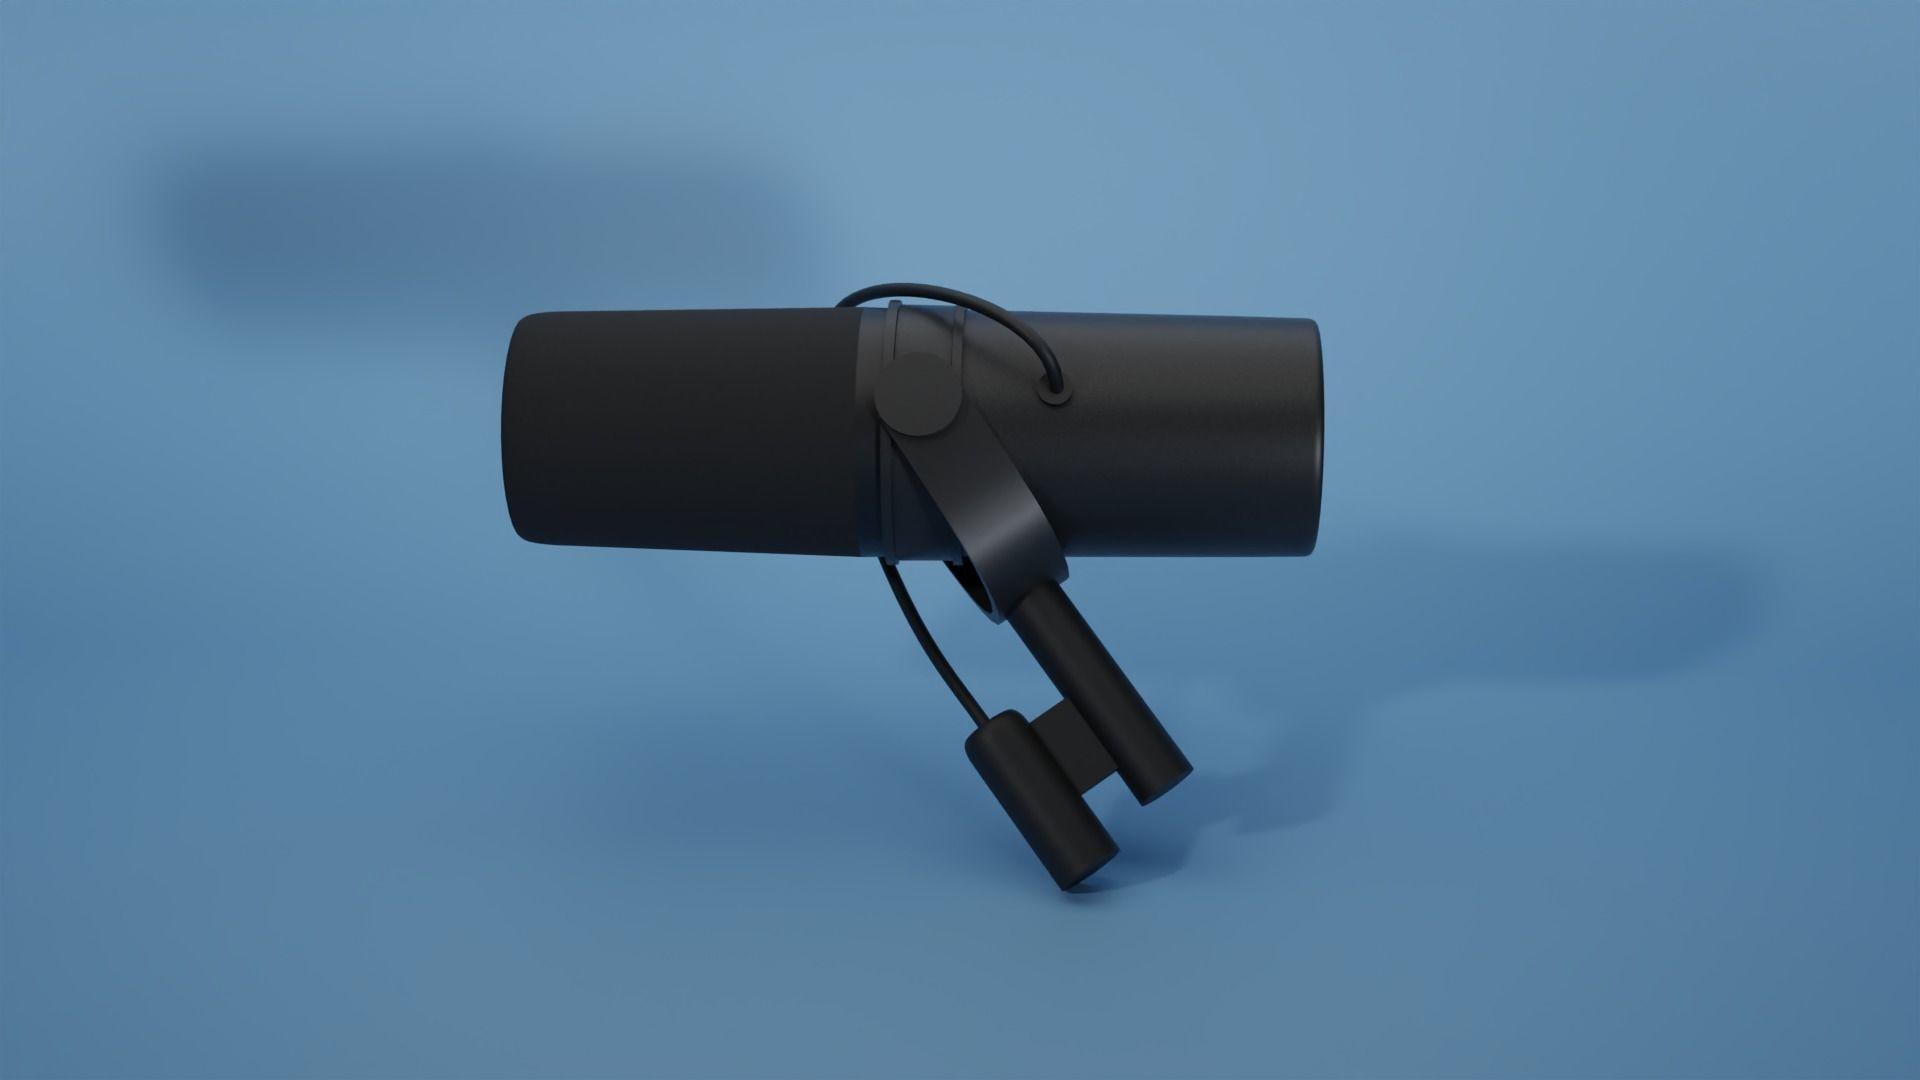 Shure SM7B cool Microphone